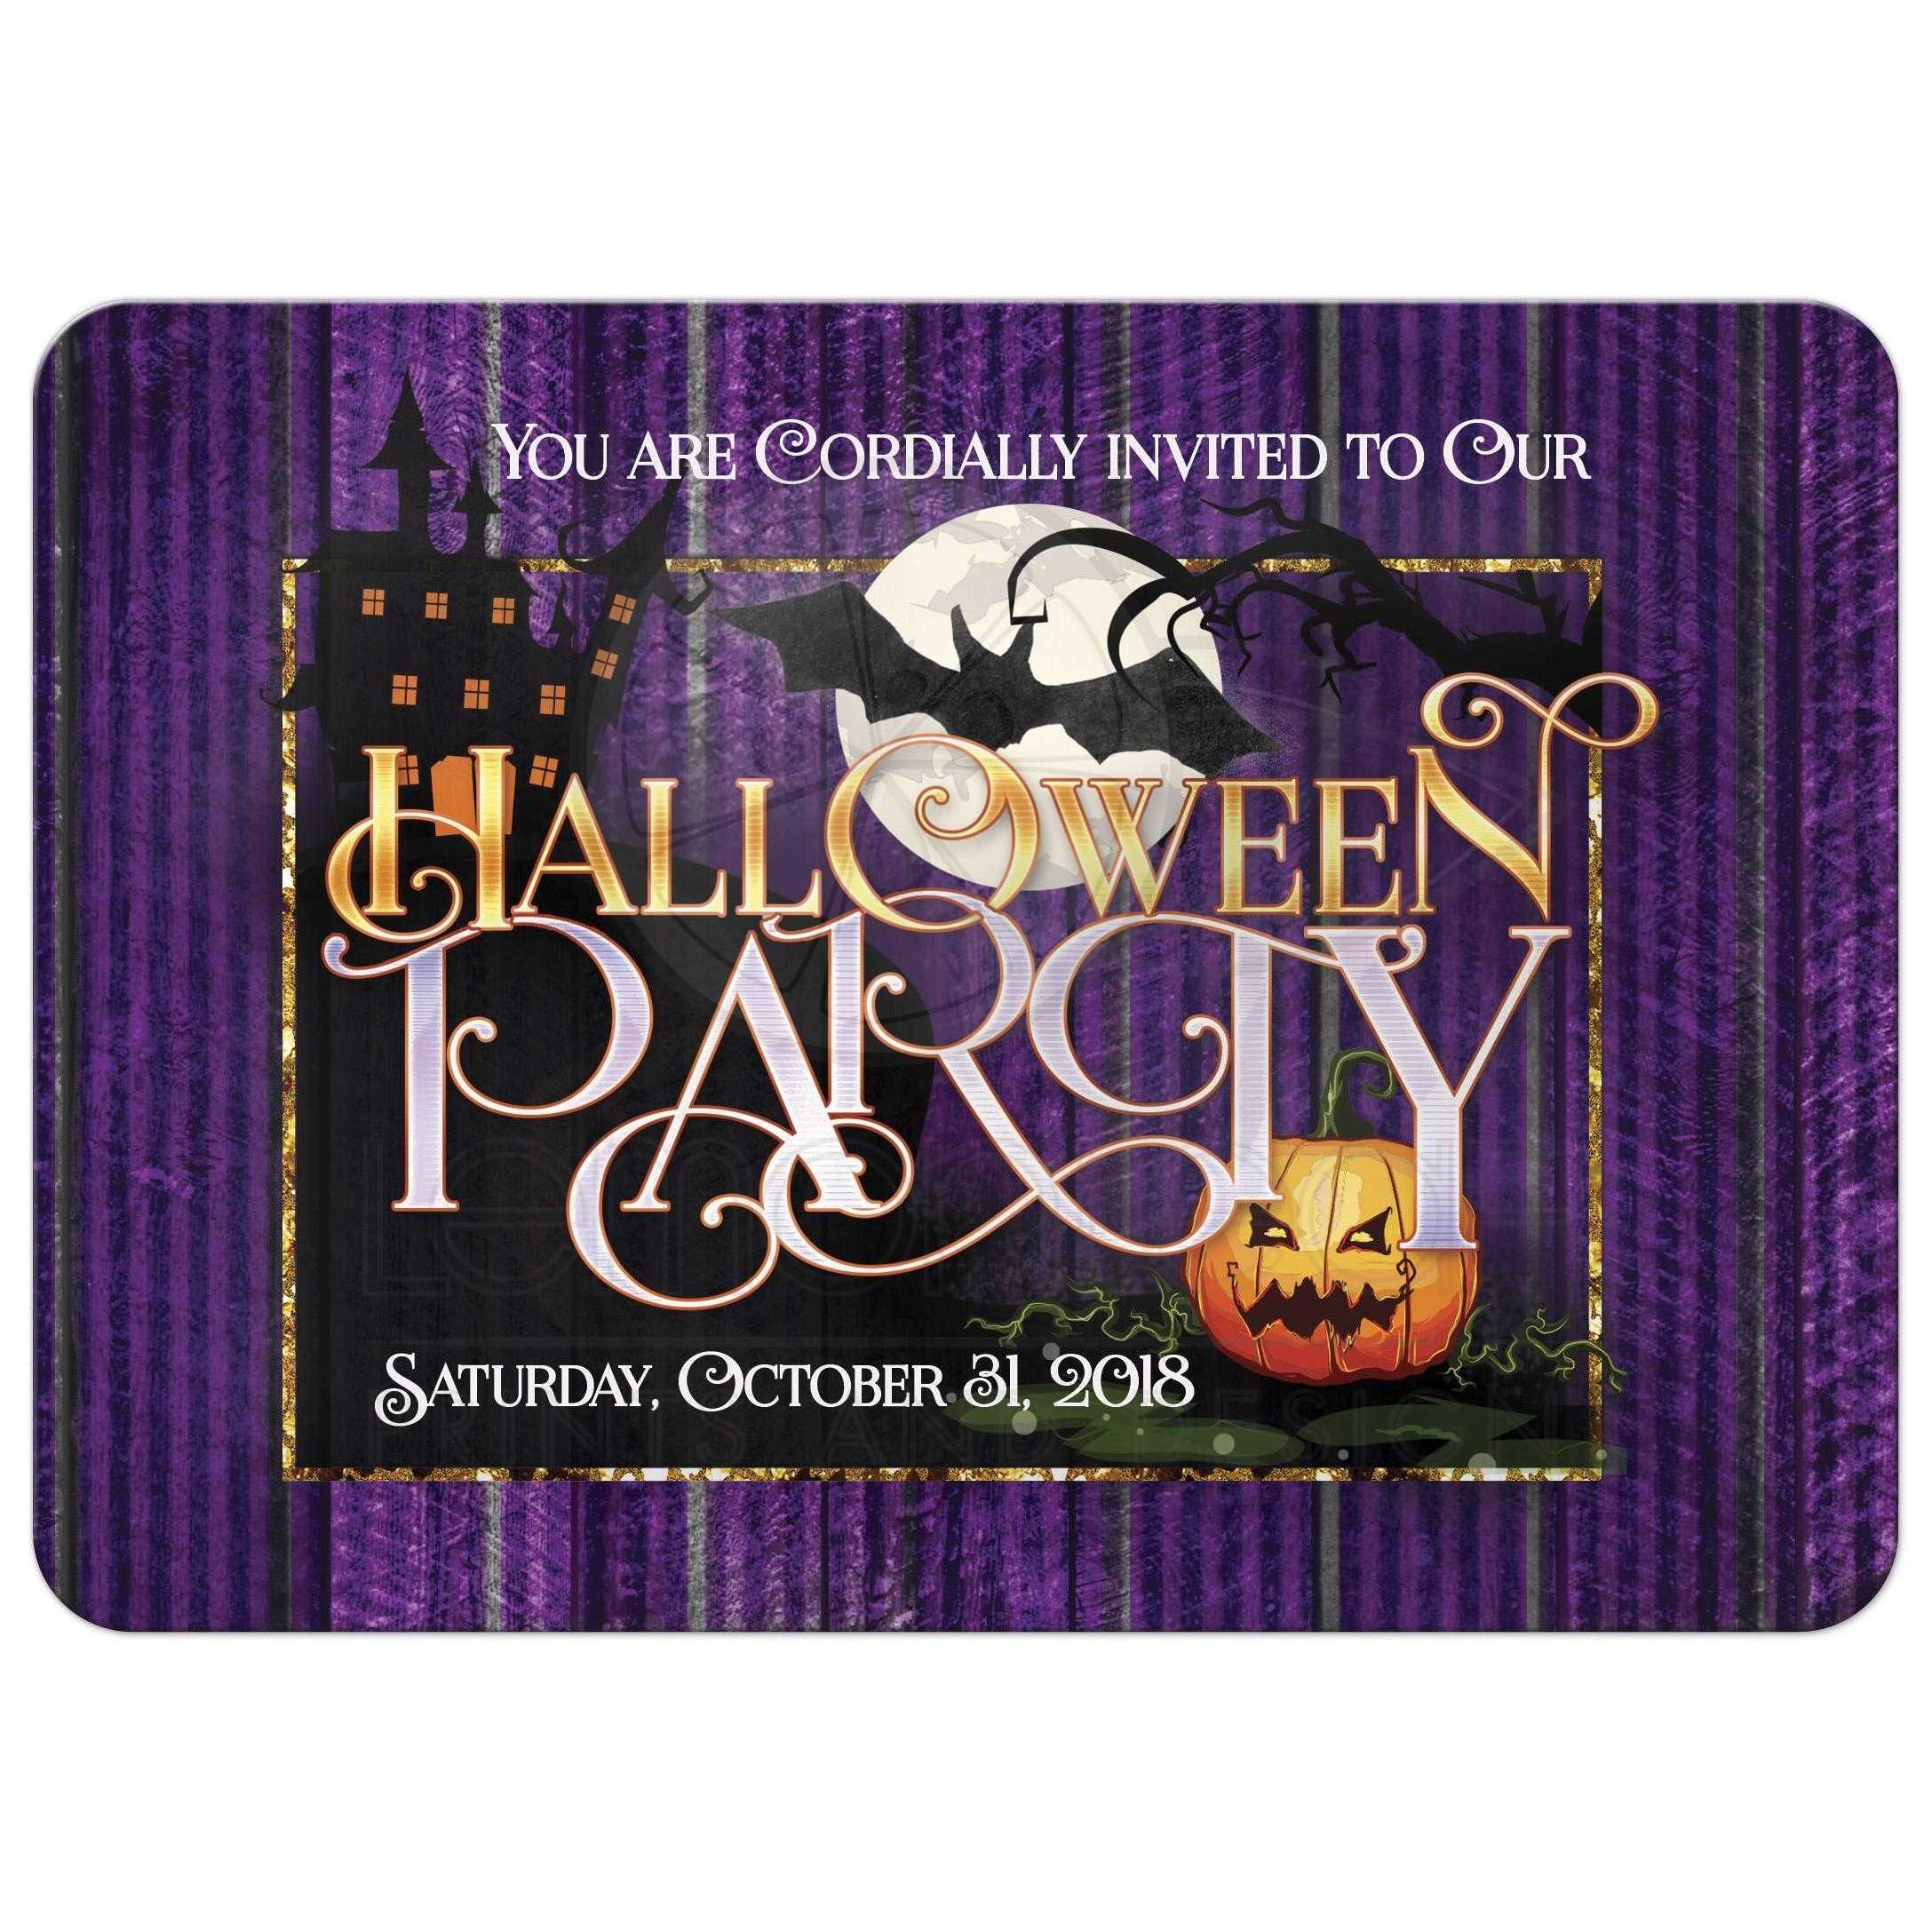 Wicked Purple Halloween Party Invitation